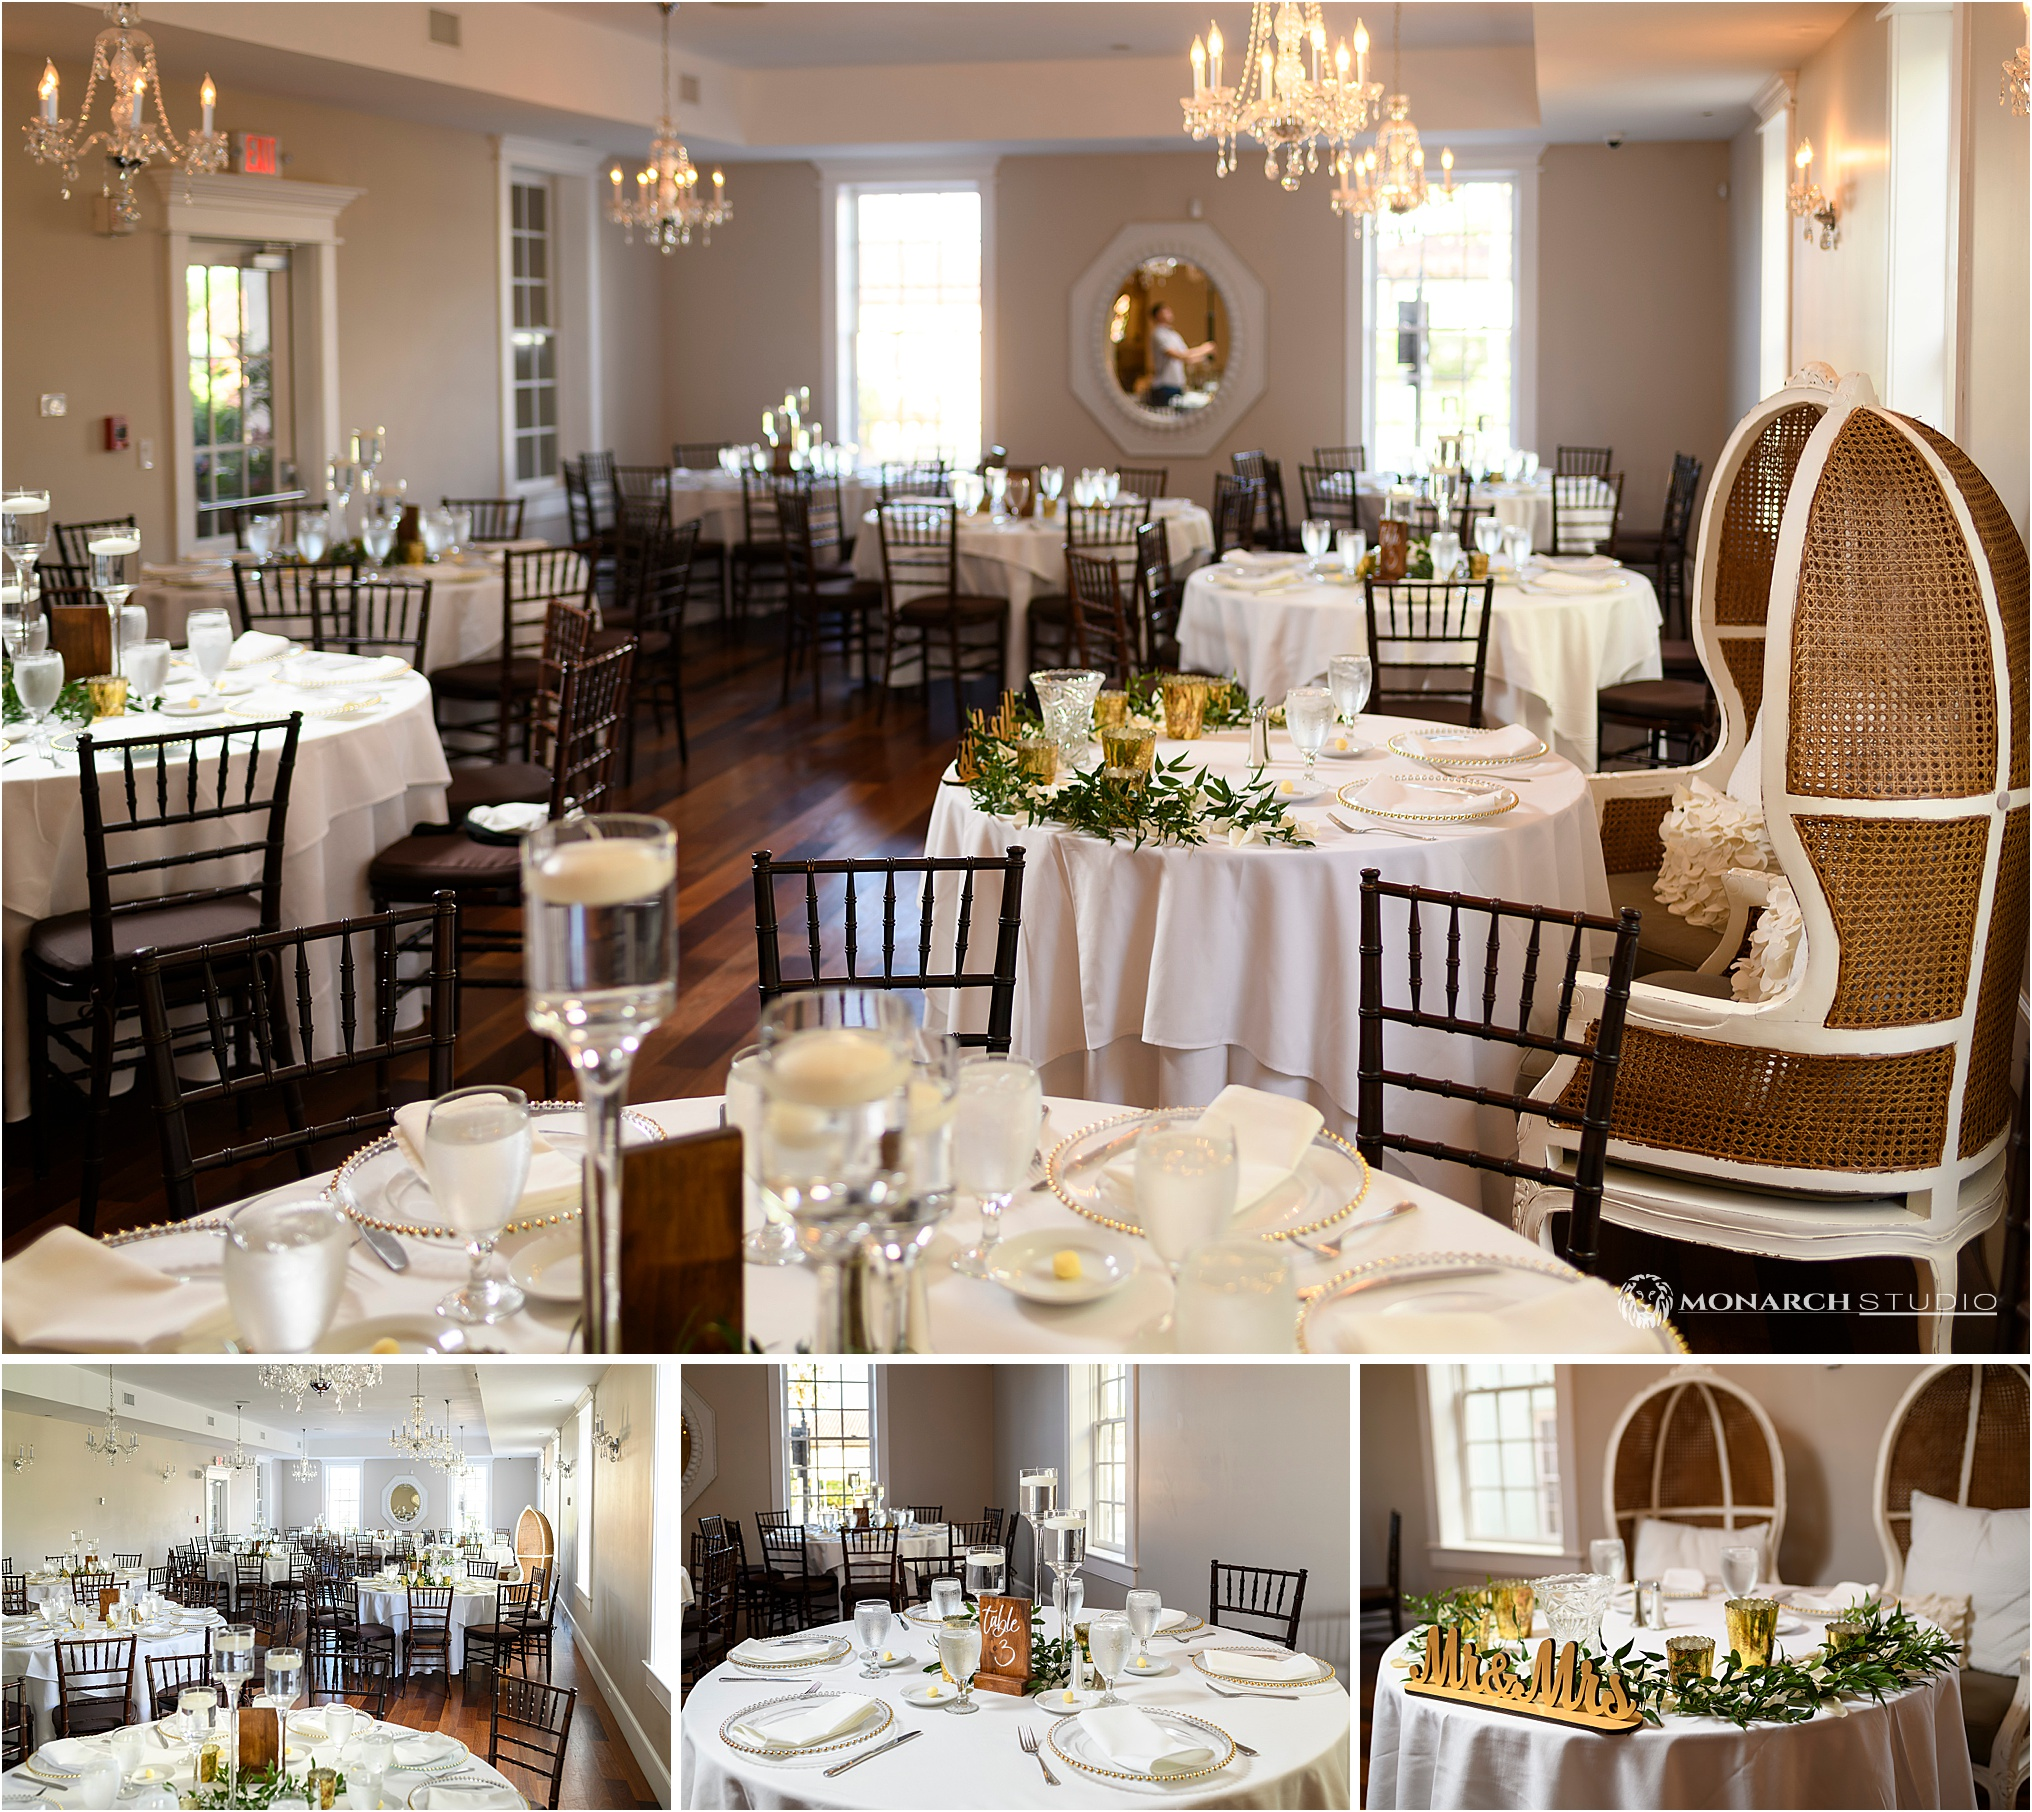 058-whiteroom-wedding-photographer-2019-05-22_0040.jpg